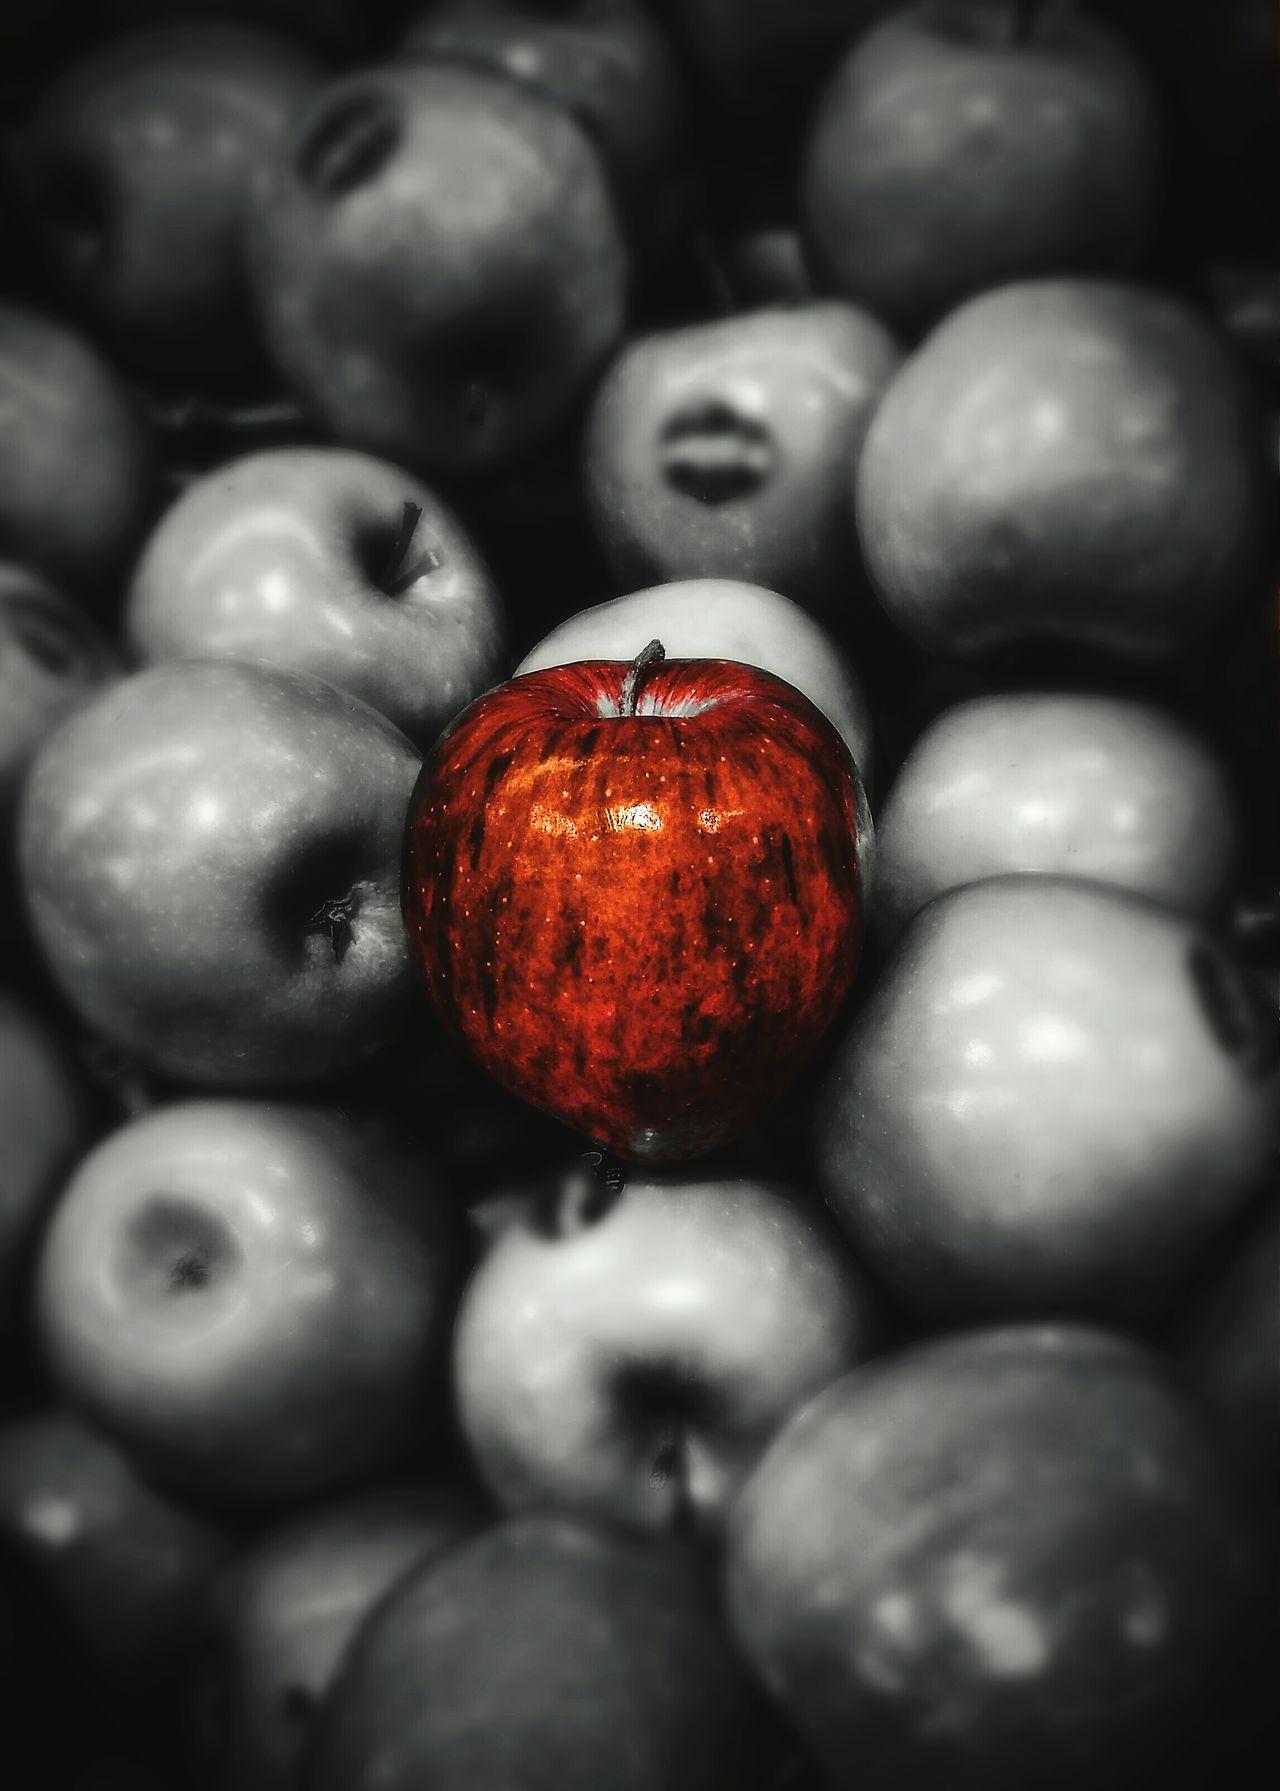 'Cursed Apple' Apple Redapple GREENAPPLES Red Snowwhite Cursed Disney Market Pile Splash Focused Smartphonephotography Photography Photographer EyeEm Gallery EyeEm Best Shots Colour Of Life